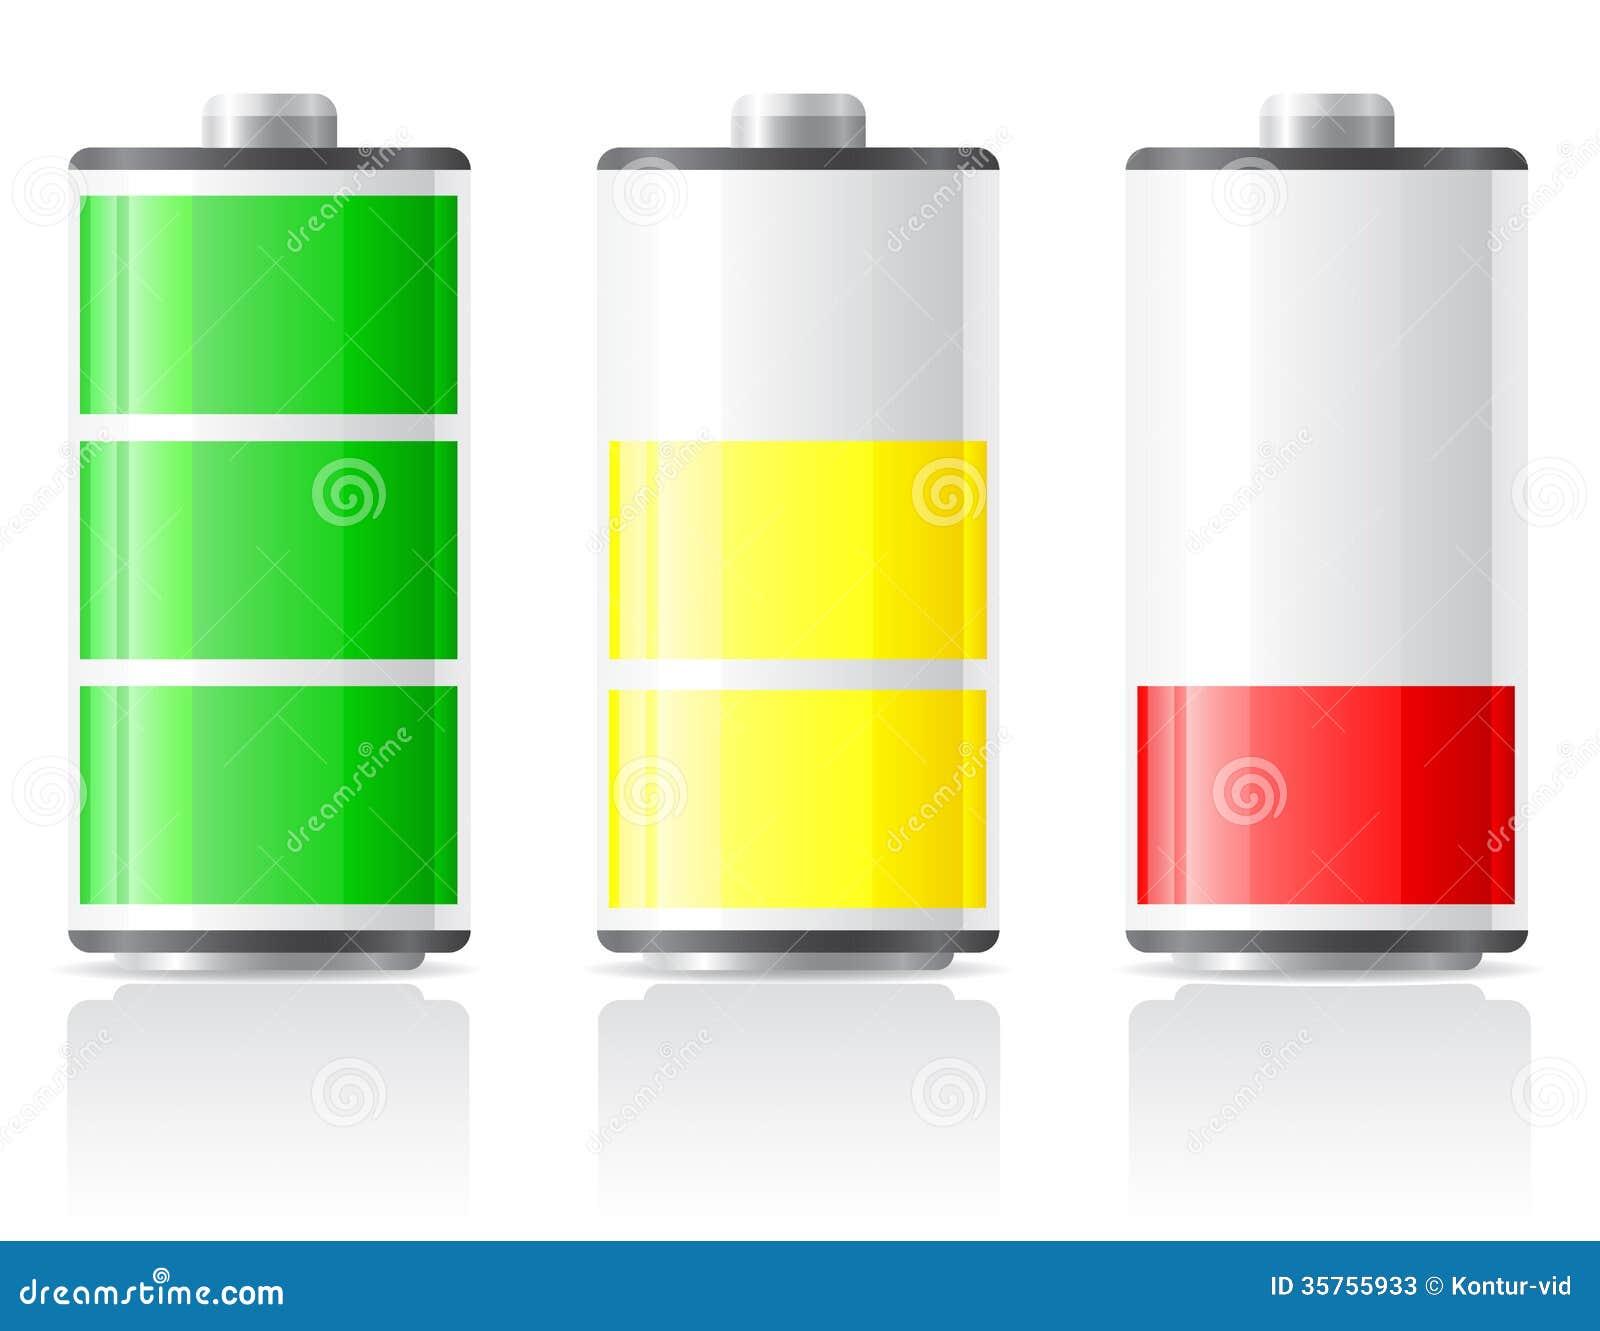 icons charge battery illustration stock illustration image 35755933. Black Bedroom Furniture Sets. Home Design Ideas